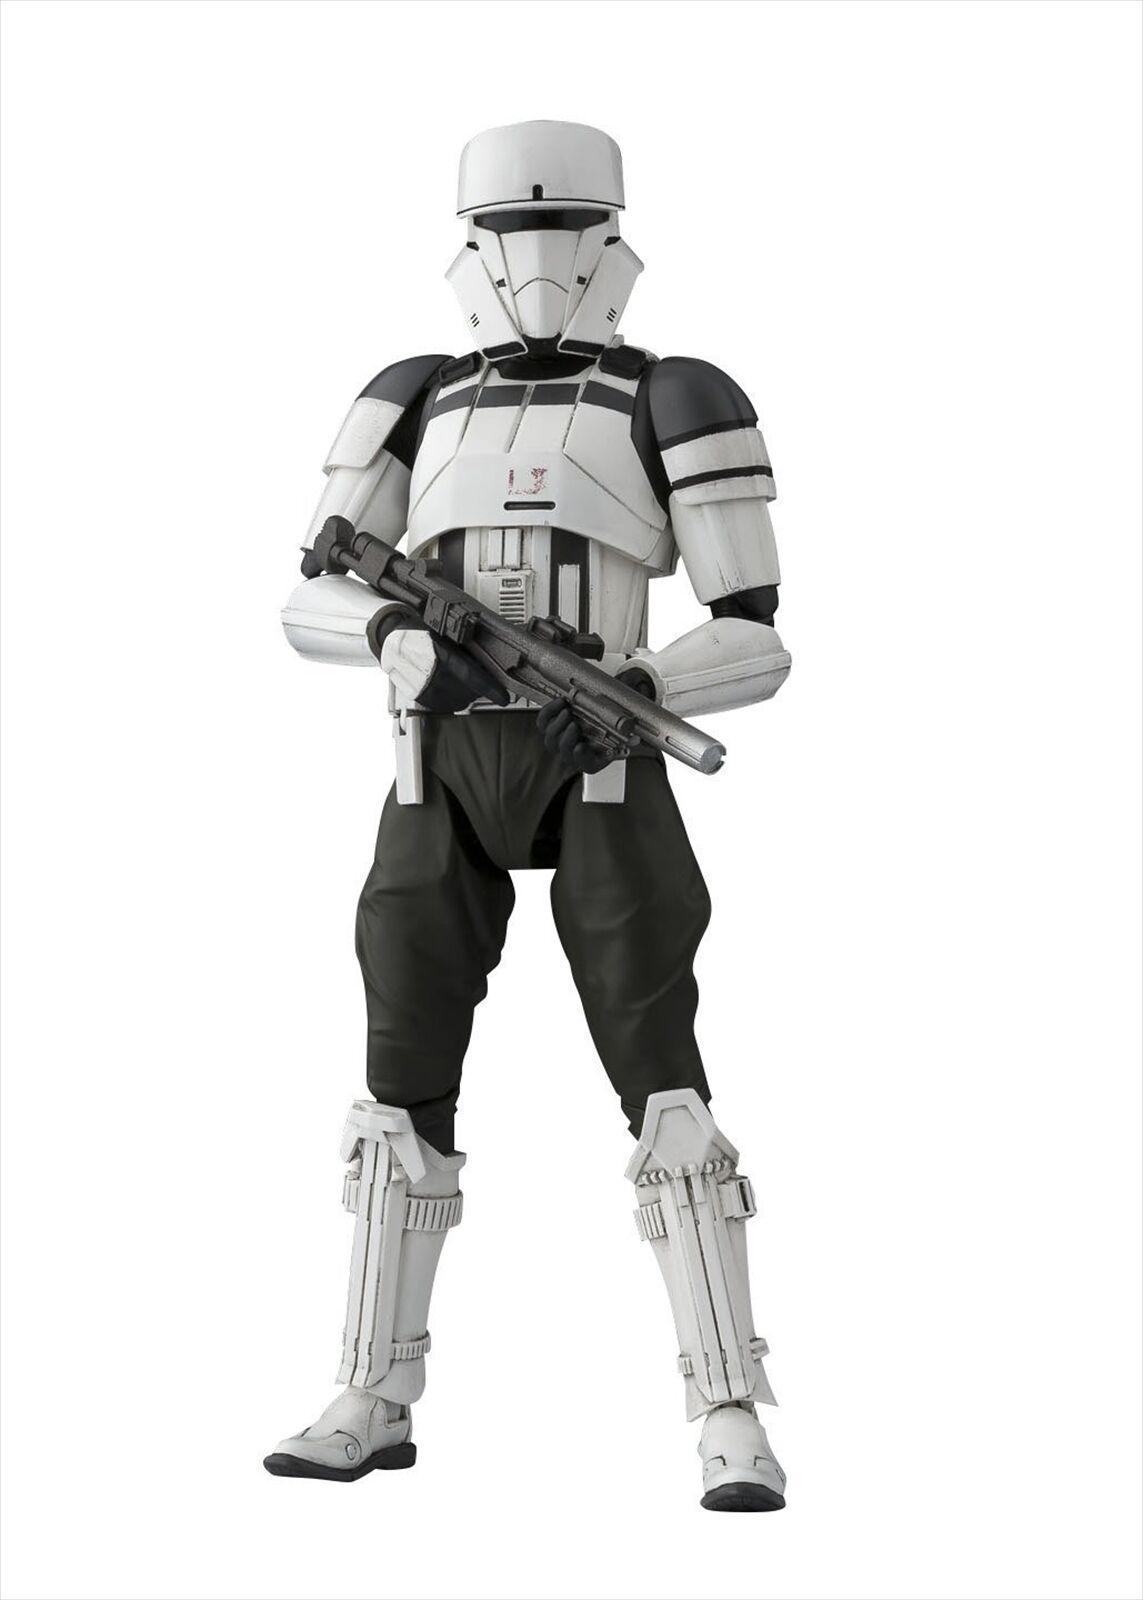 Bandai S.H. Figuarts Star Wars Rogue One Combat Assault Tank Commander Figure